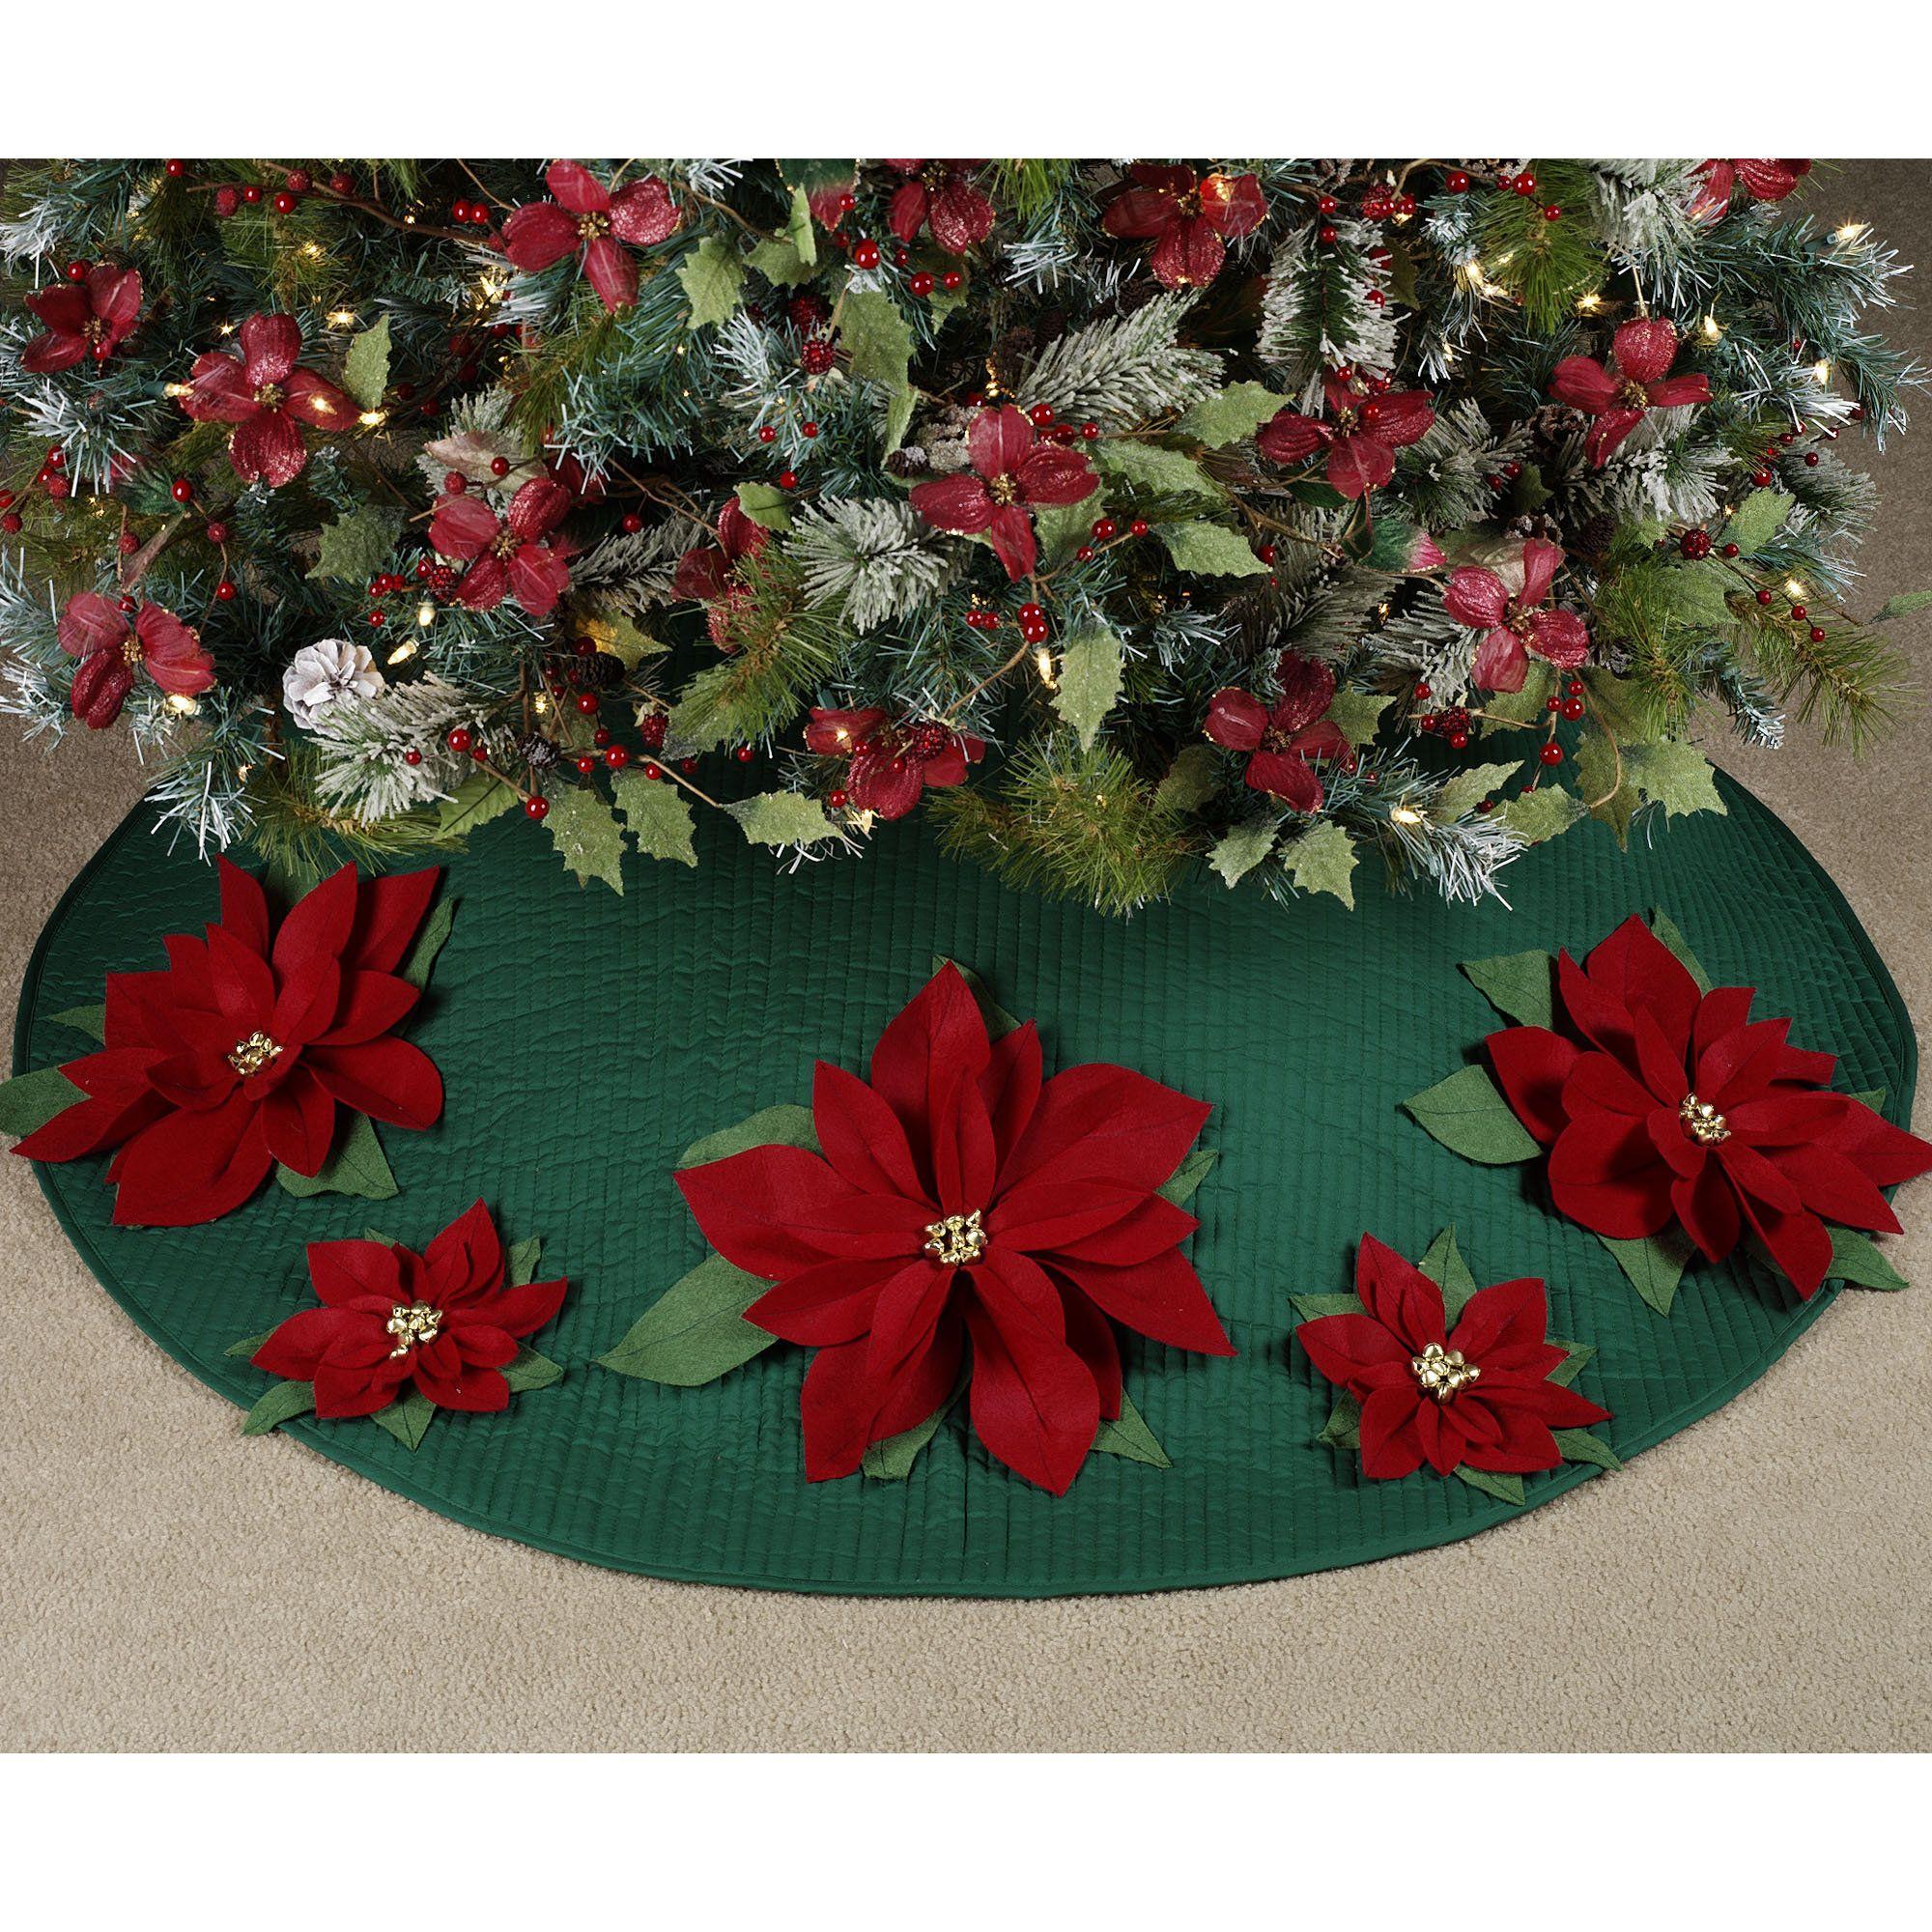 Felt Poinsettia Quilted Christmas Tree Skirt